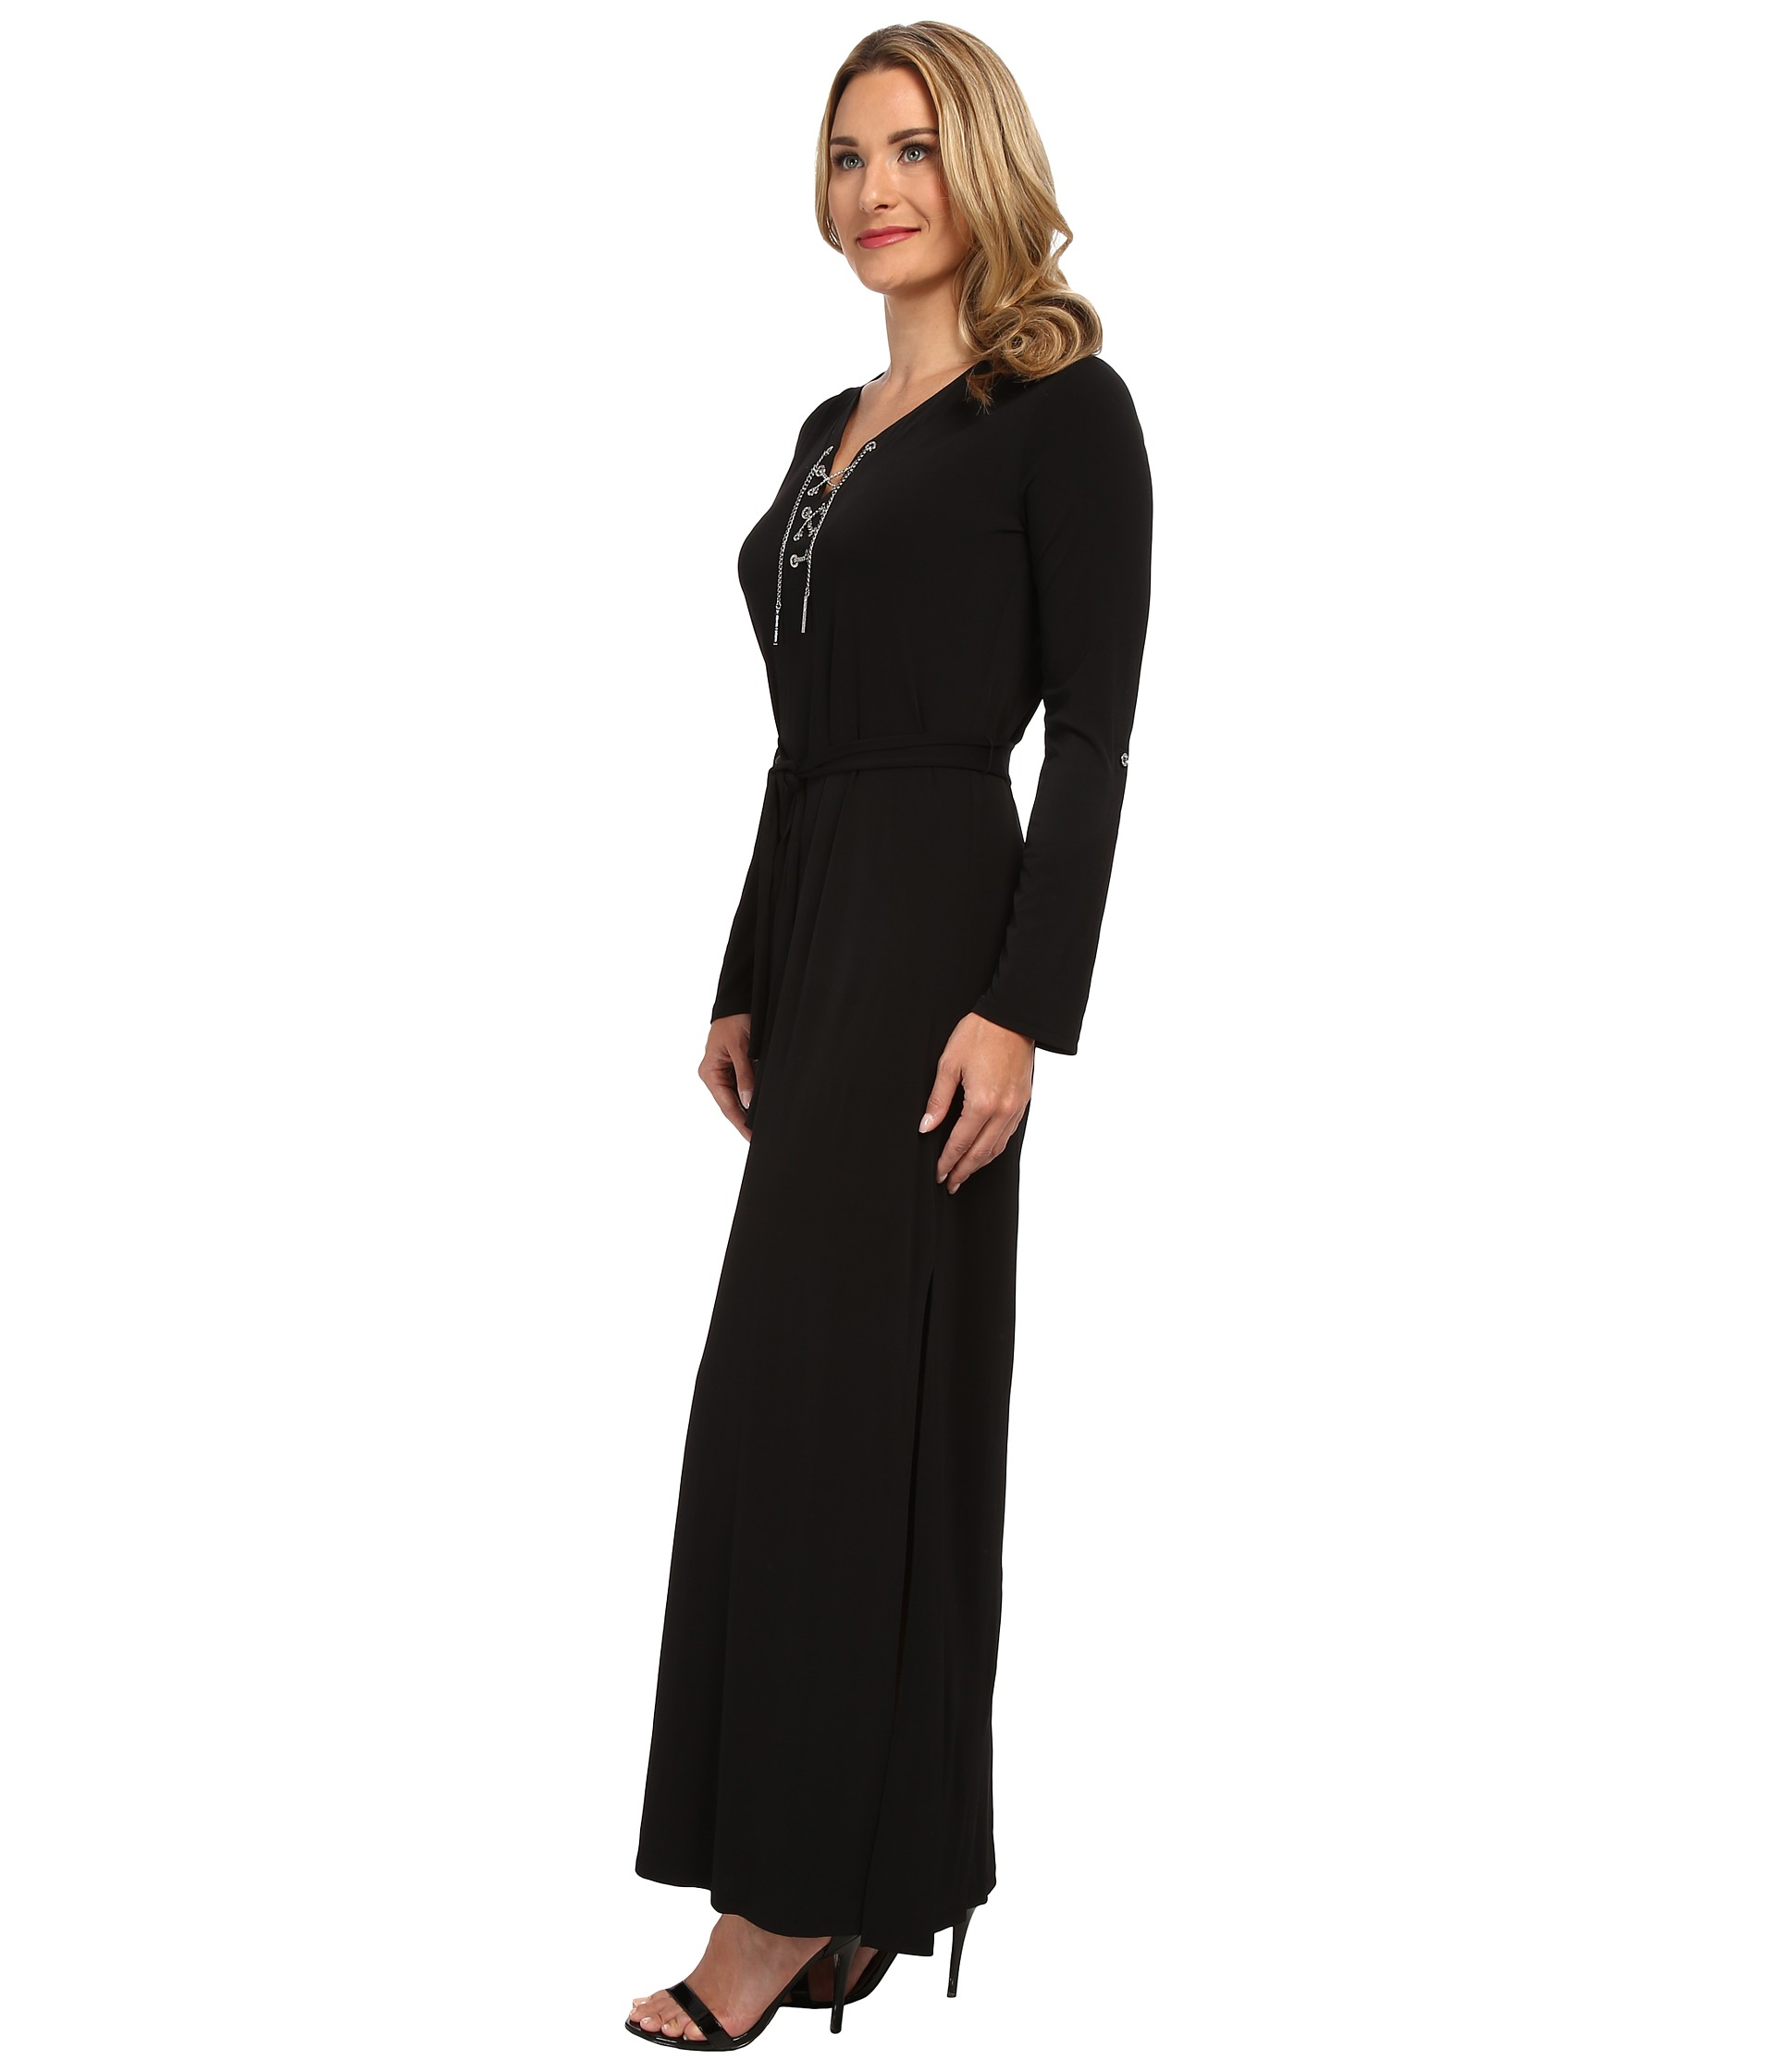 525acbe0954 MICHAEL Michael Kors Maxi Chain Tie Dress in Black - Lyst